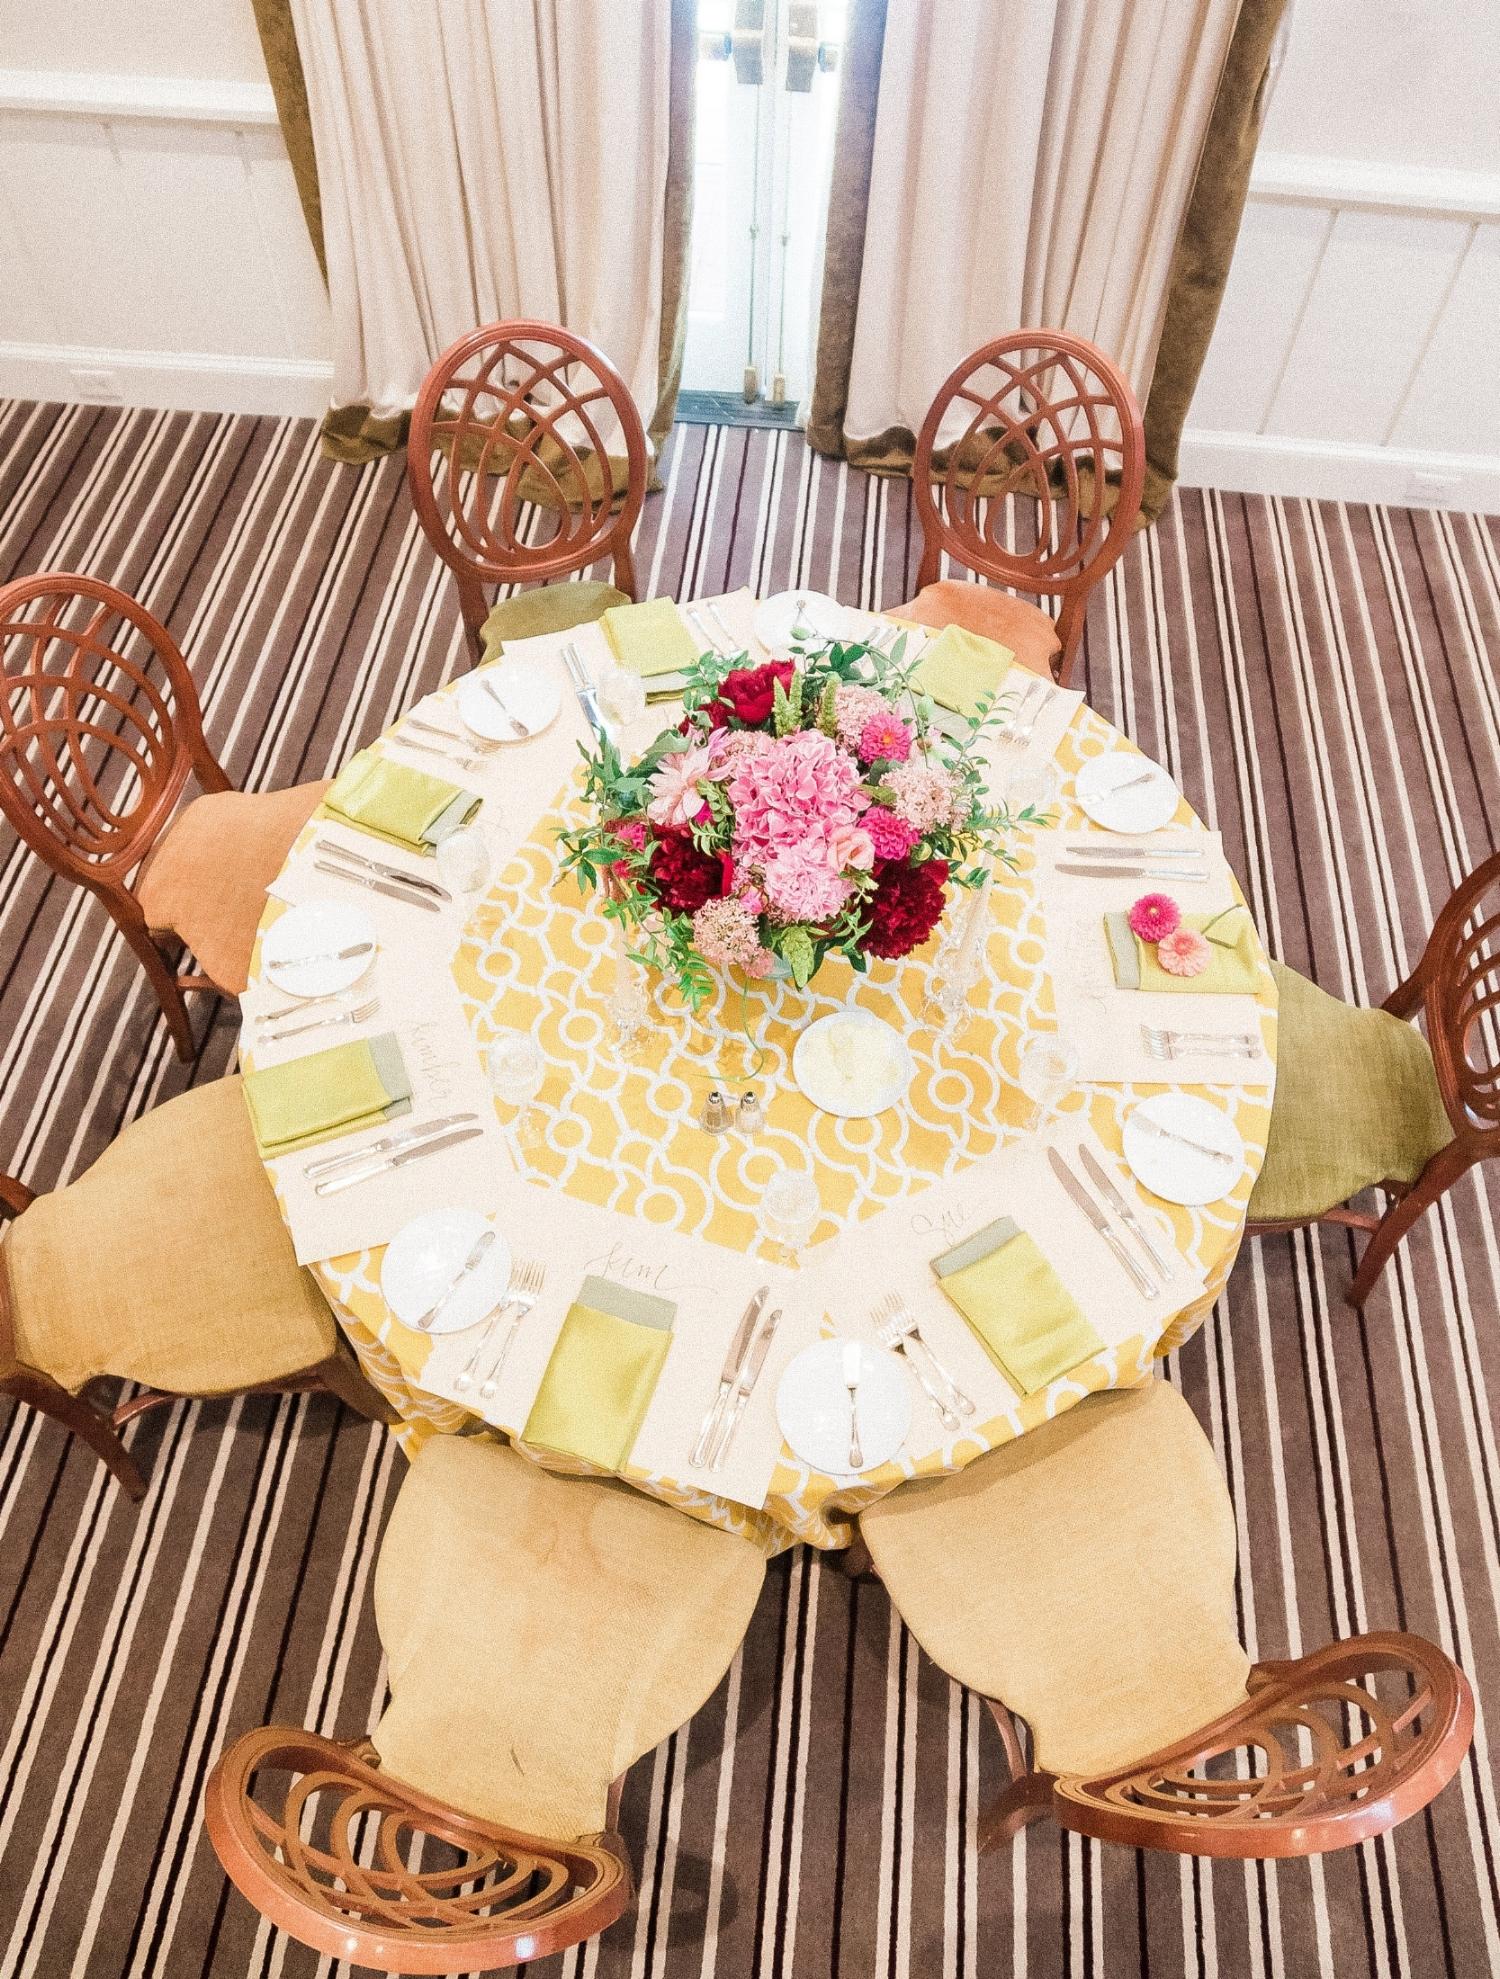 Florals & Designs: Intrigue Designs  Photo Credit:  Amanda Weaver Photography